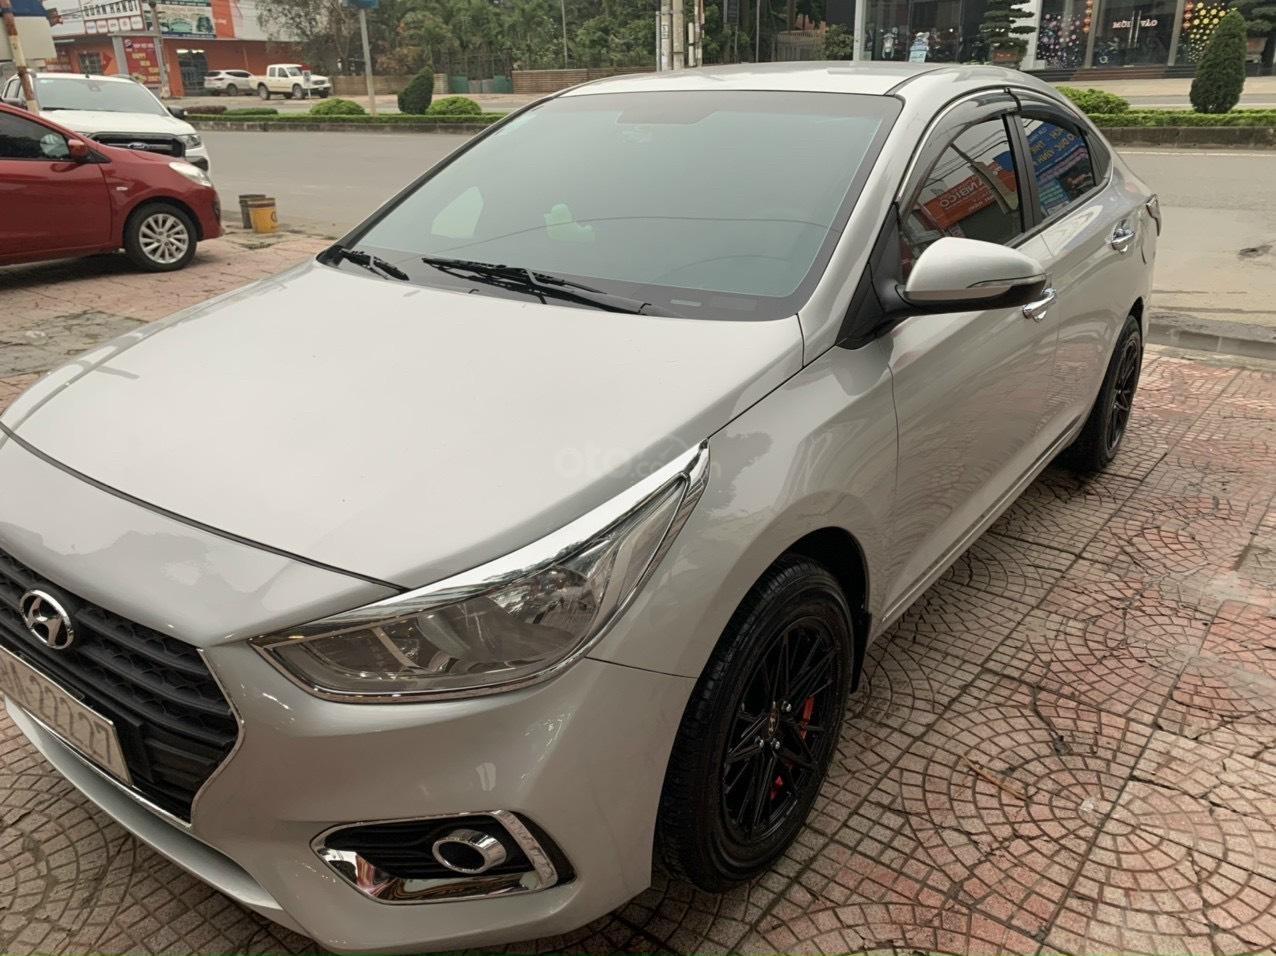 Cần bán Hyundai Accent 1.4 MT 2018 full đồ chơi (7)